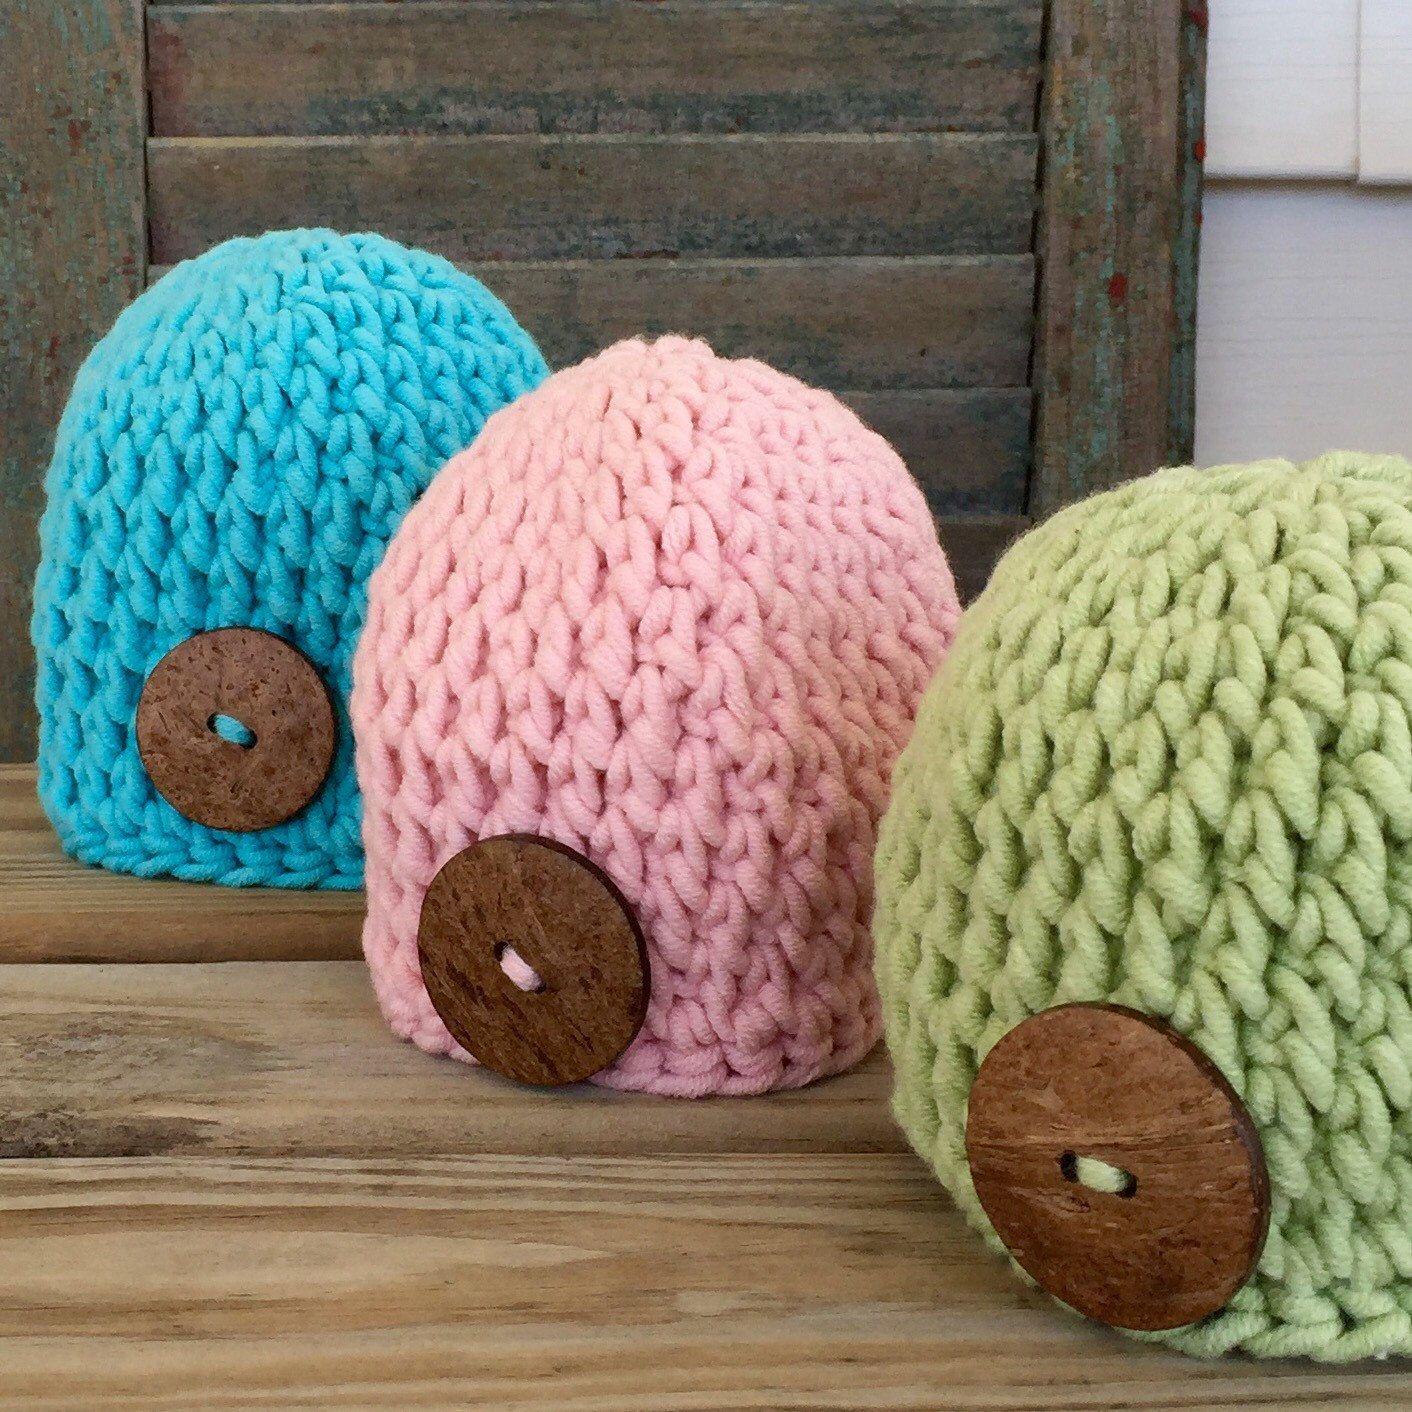 e52aa2ddea9 Purple crochet baby hat with coconut button